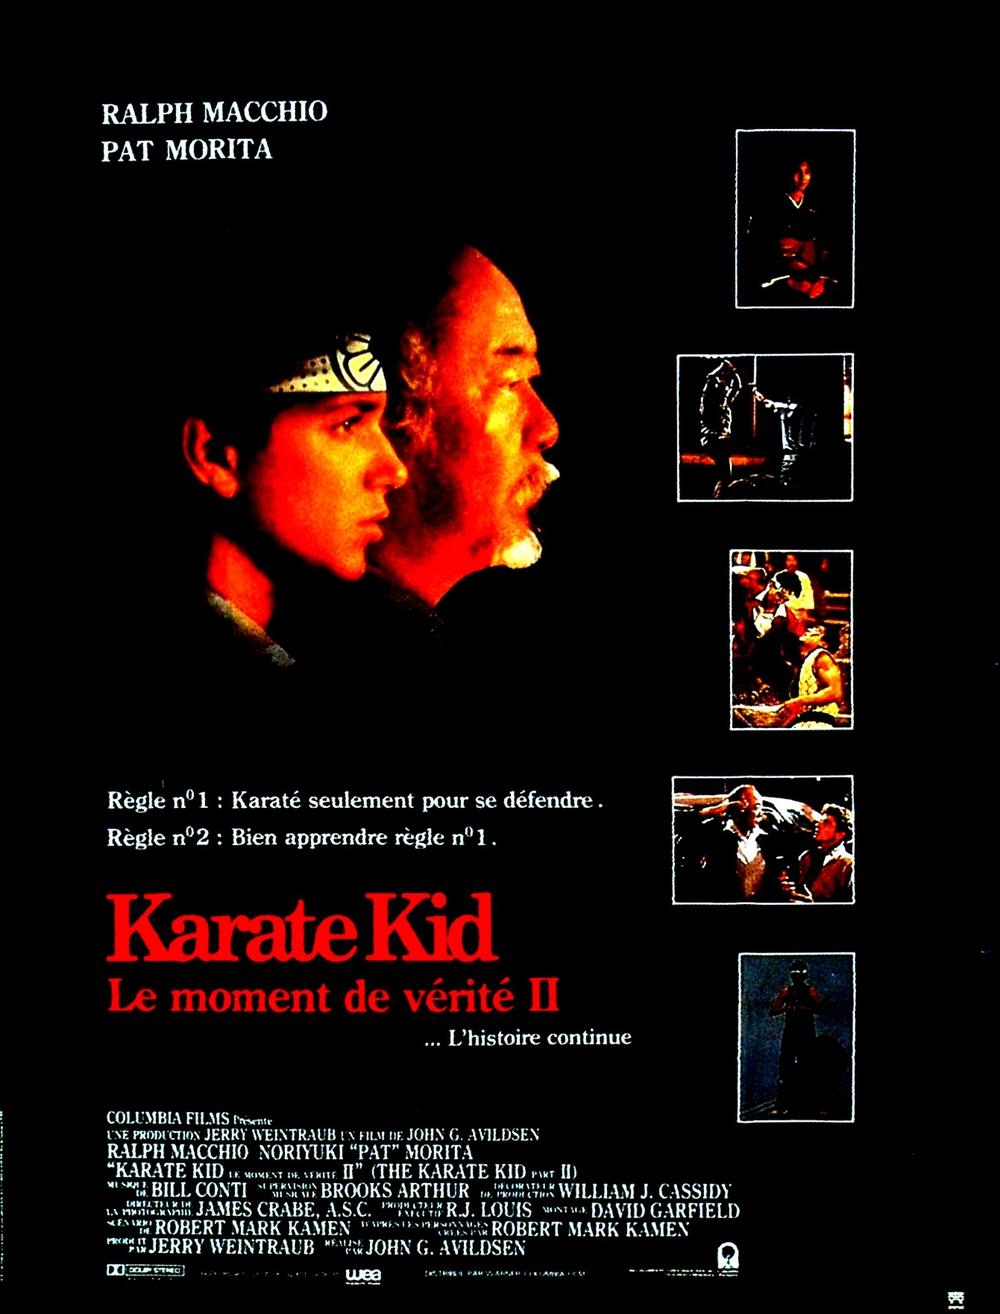 Film Mettant En Scène Maître Miyagi : mettant, scène, maître, miyagi, Karate, Moment, Vérité:, Retour, Sources, Miyagi